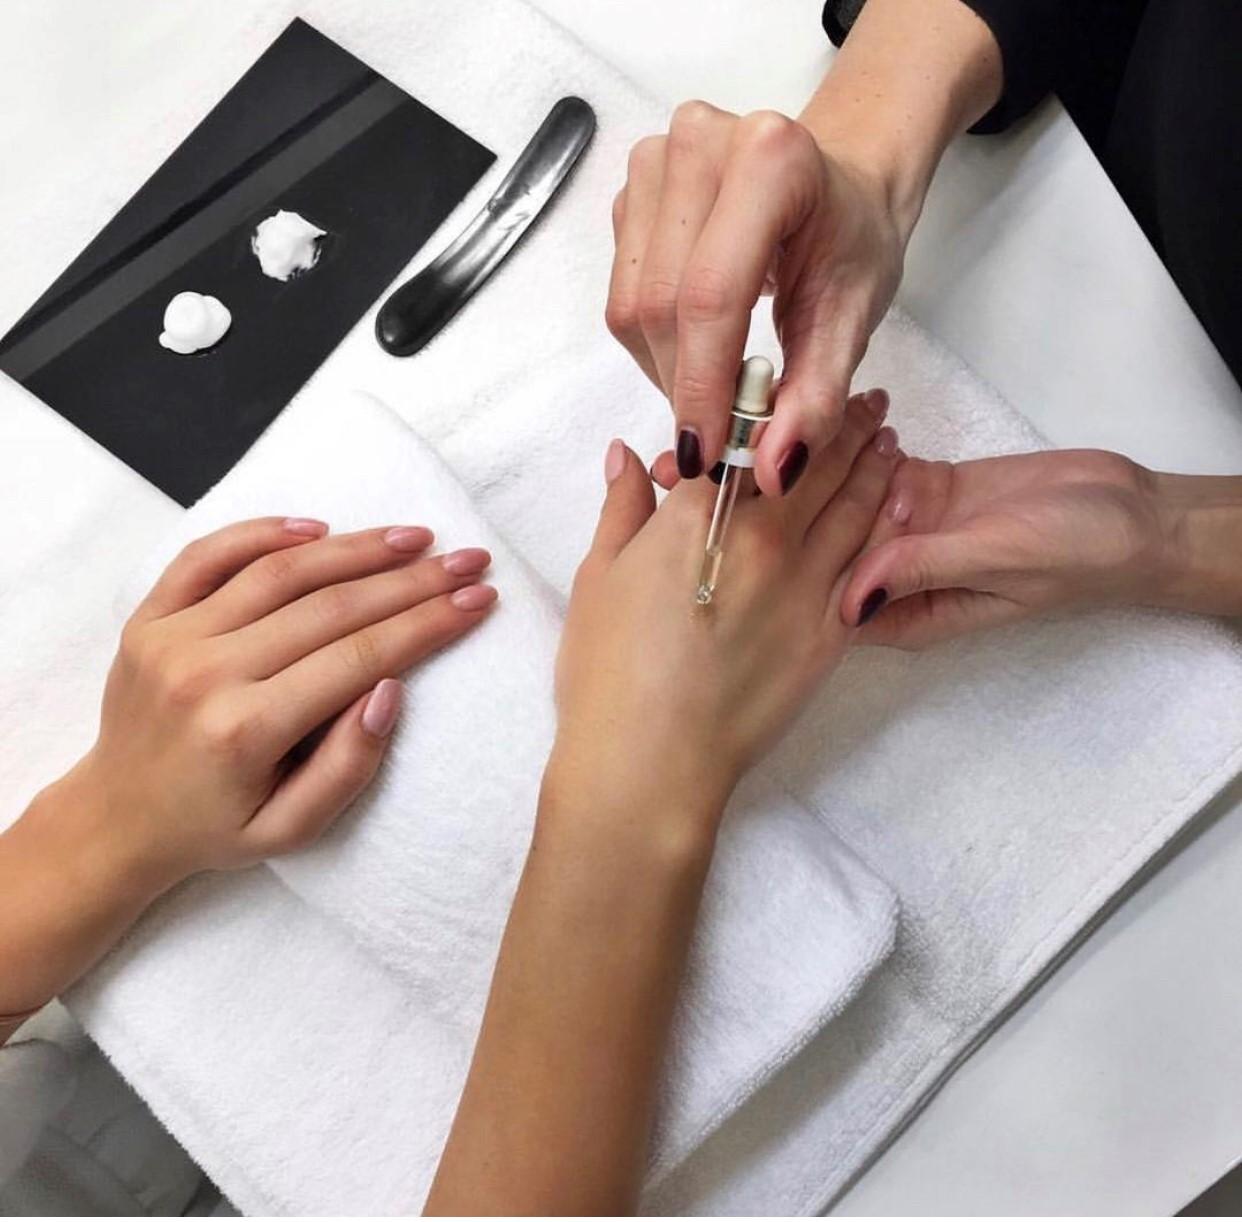 nail-spa-detox-Bastien-Gonzalez-beauty-nokti-modnialmanah